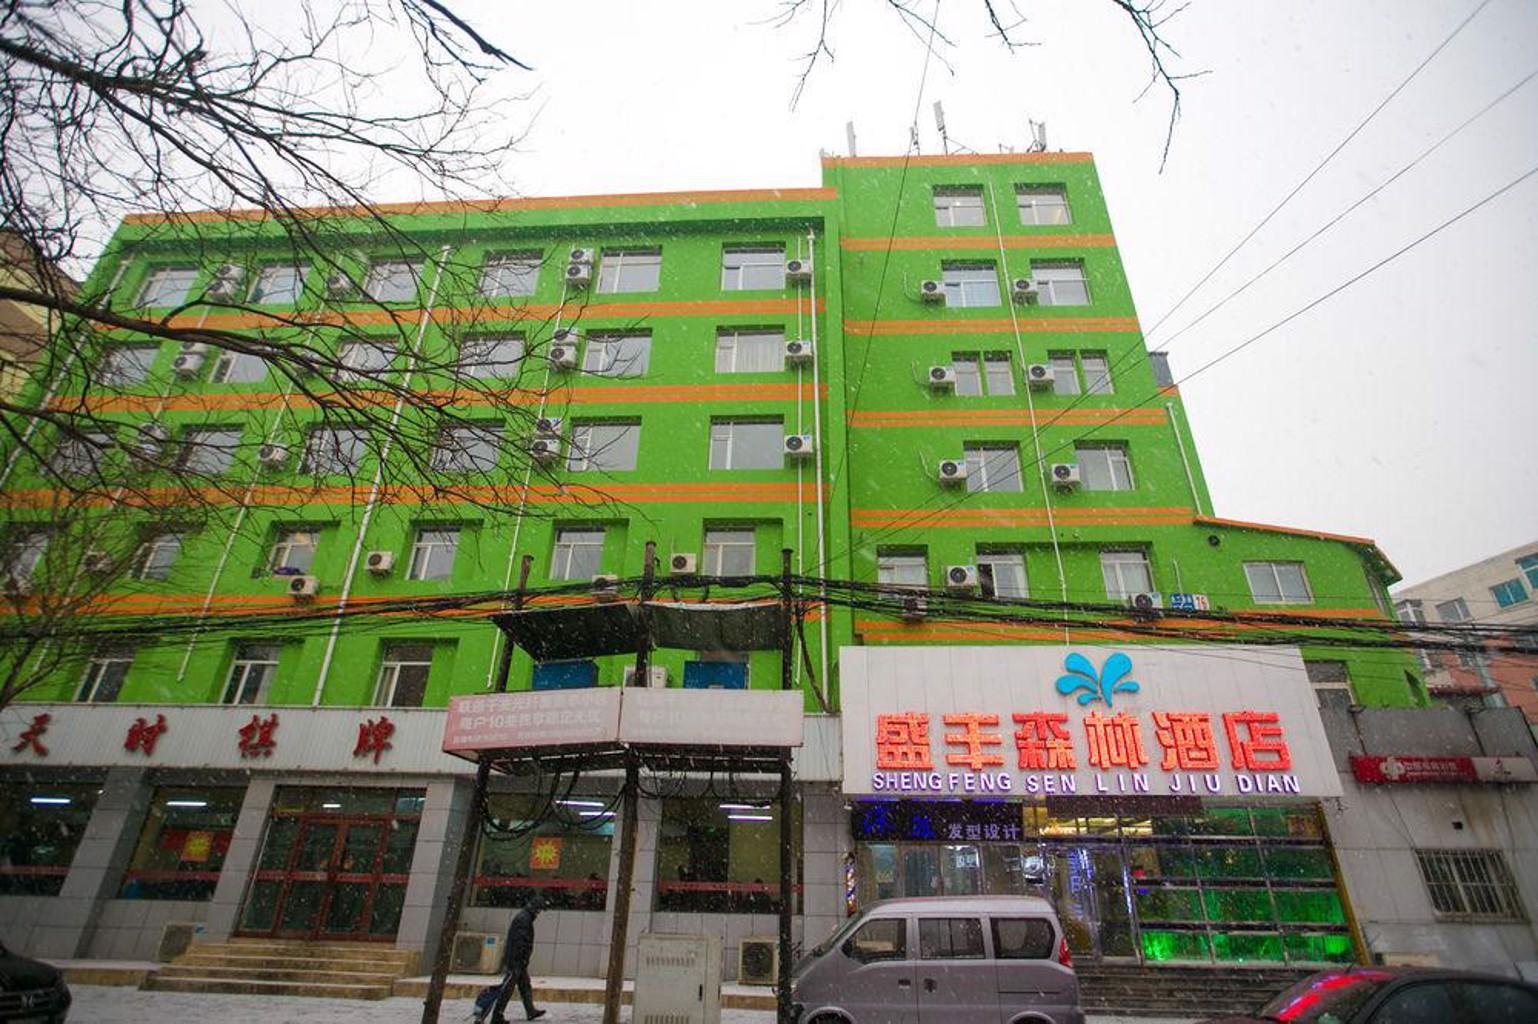 Shengfeng Forrest Holiday Hotel